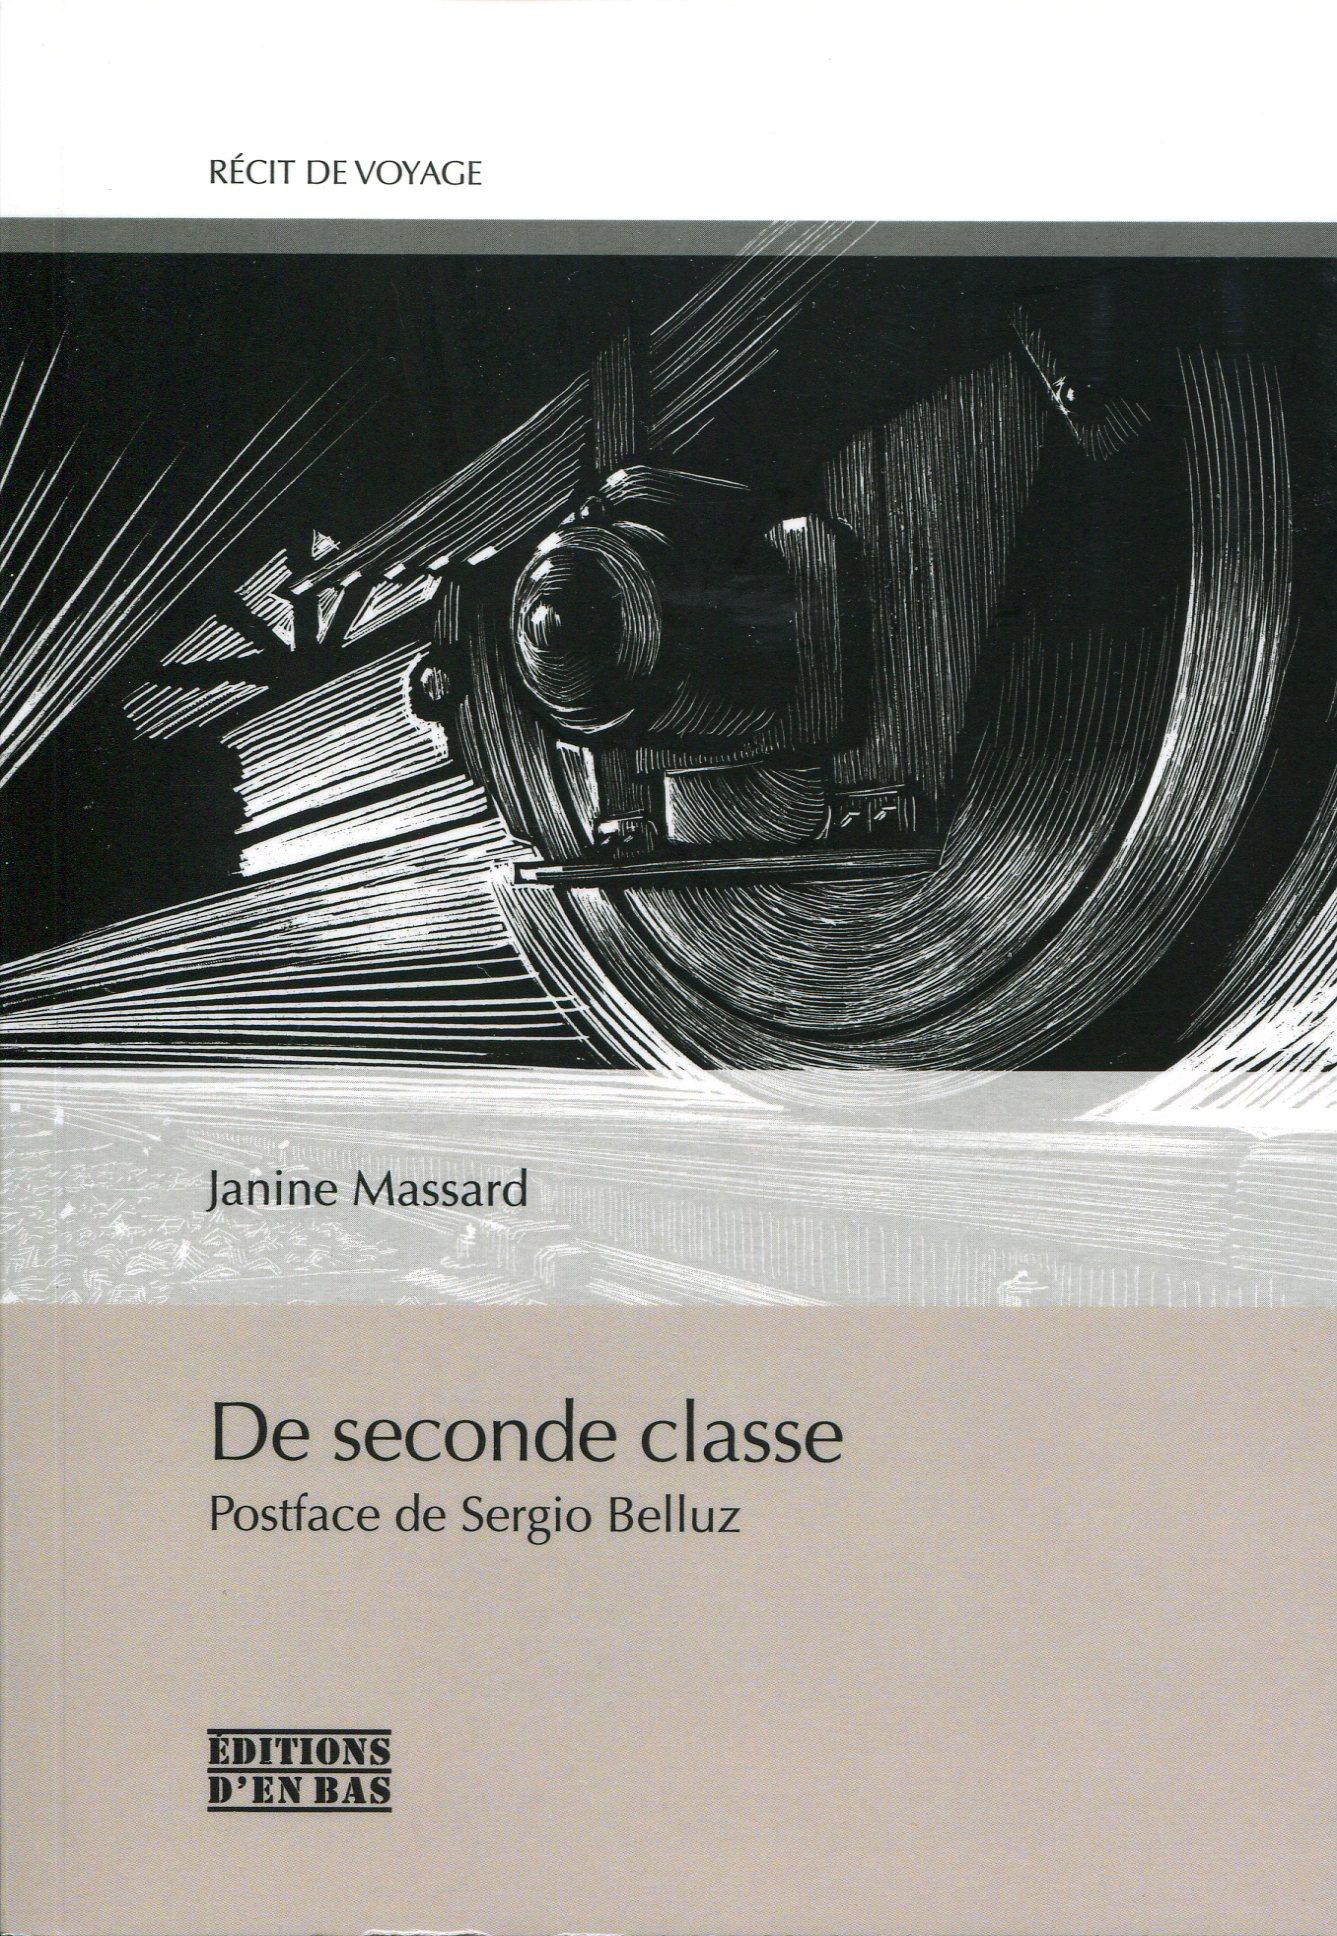 2016 Massard Janine De seconde classe.jpg